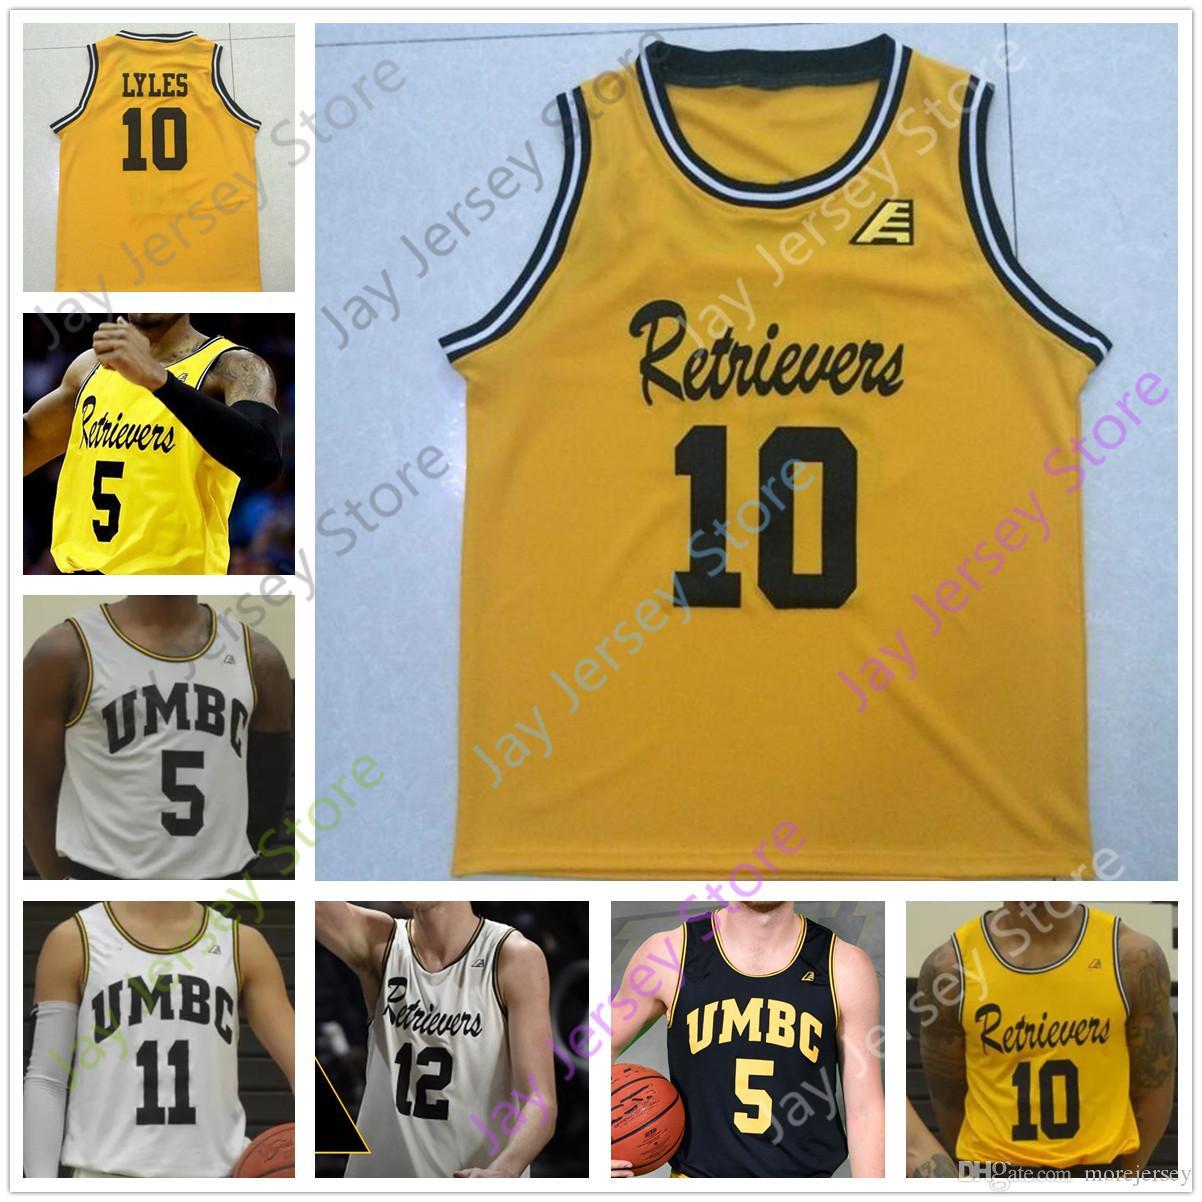 Personnalisé UMBC Retrievers Basketball Jersey College L.J. Owens Darnell Rogers Dimitrije Spasojevic Conseil Ricky II Brandon Horvath